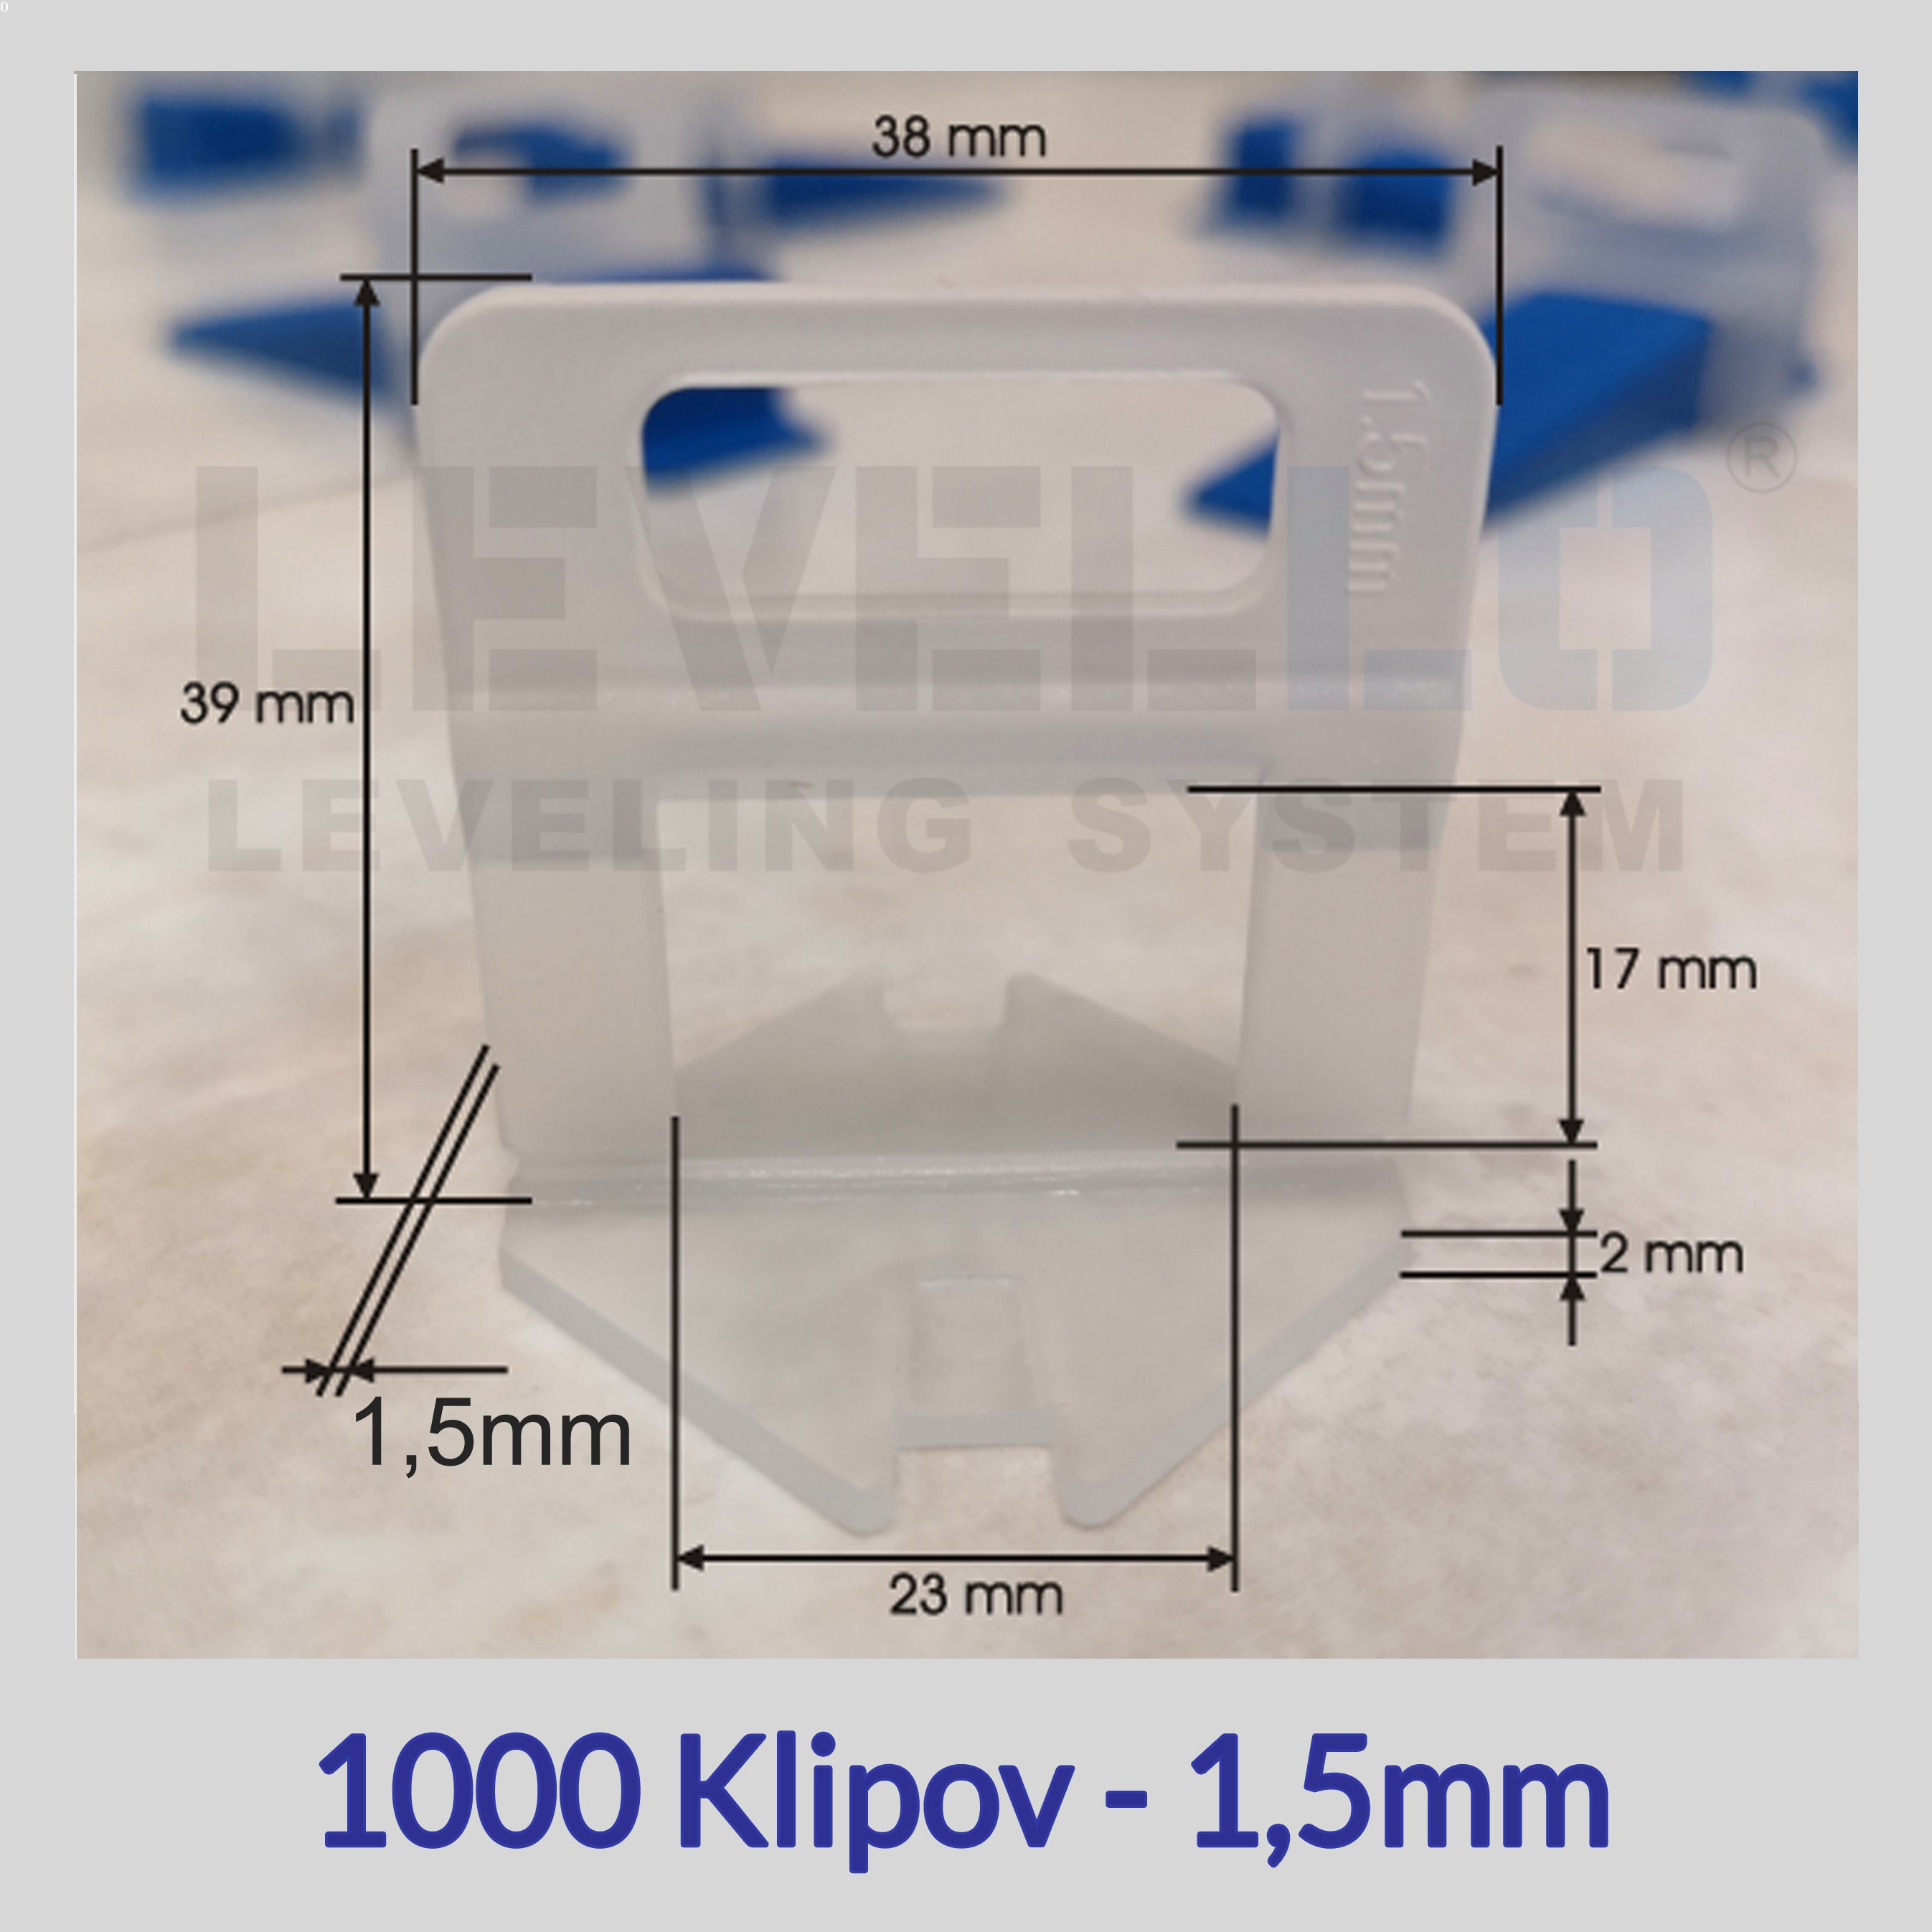 Klipy Eko LEVELLO ® 1,5 mm, 1000 kusov